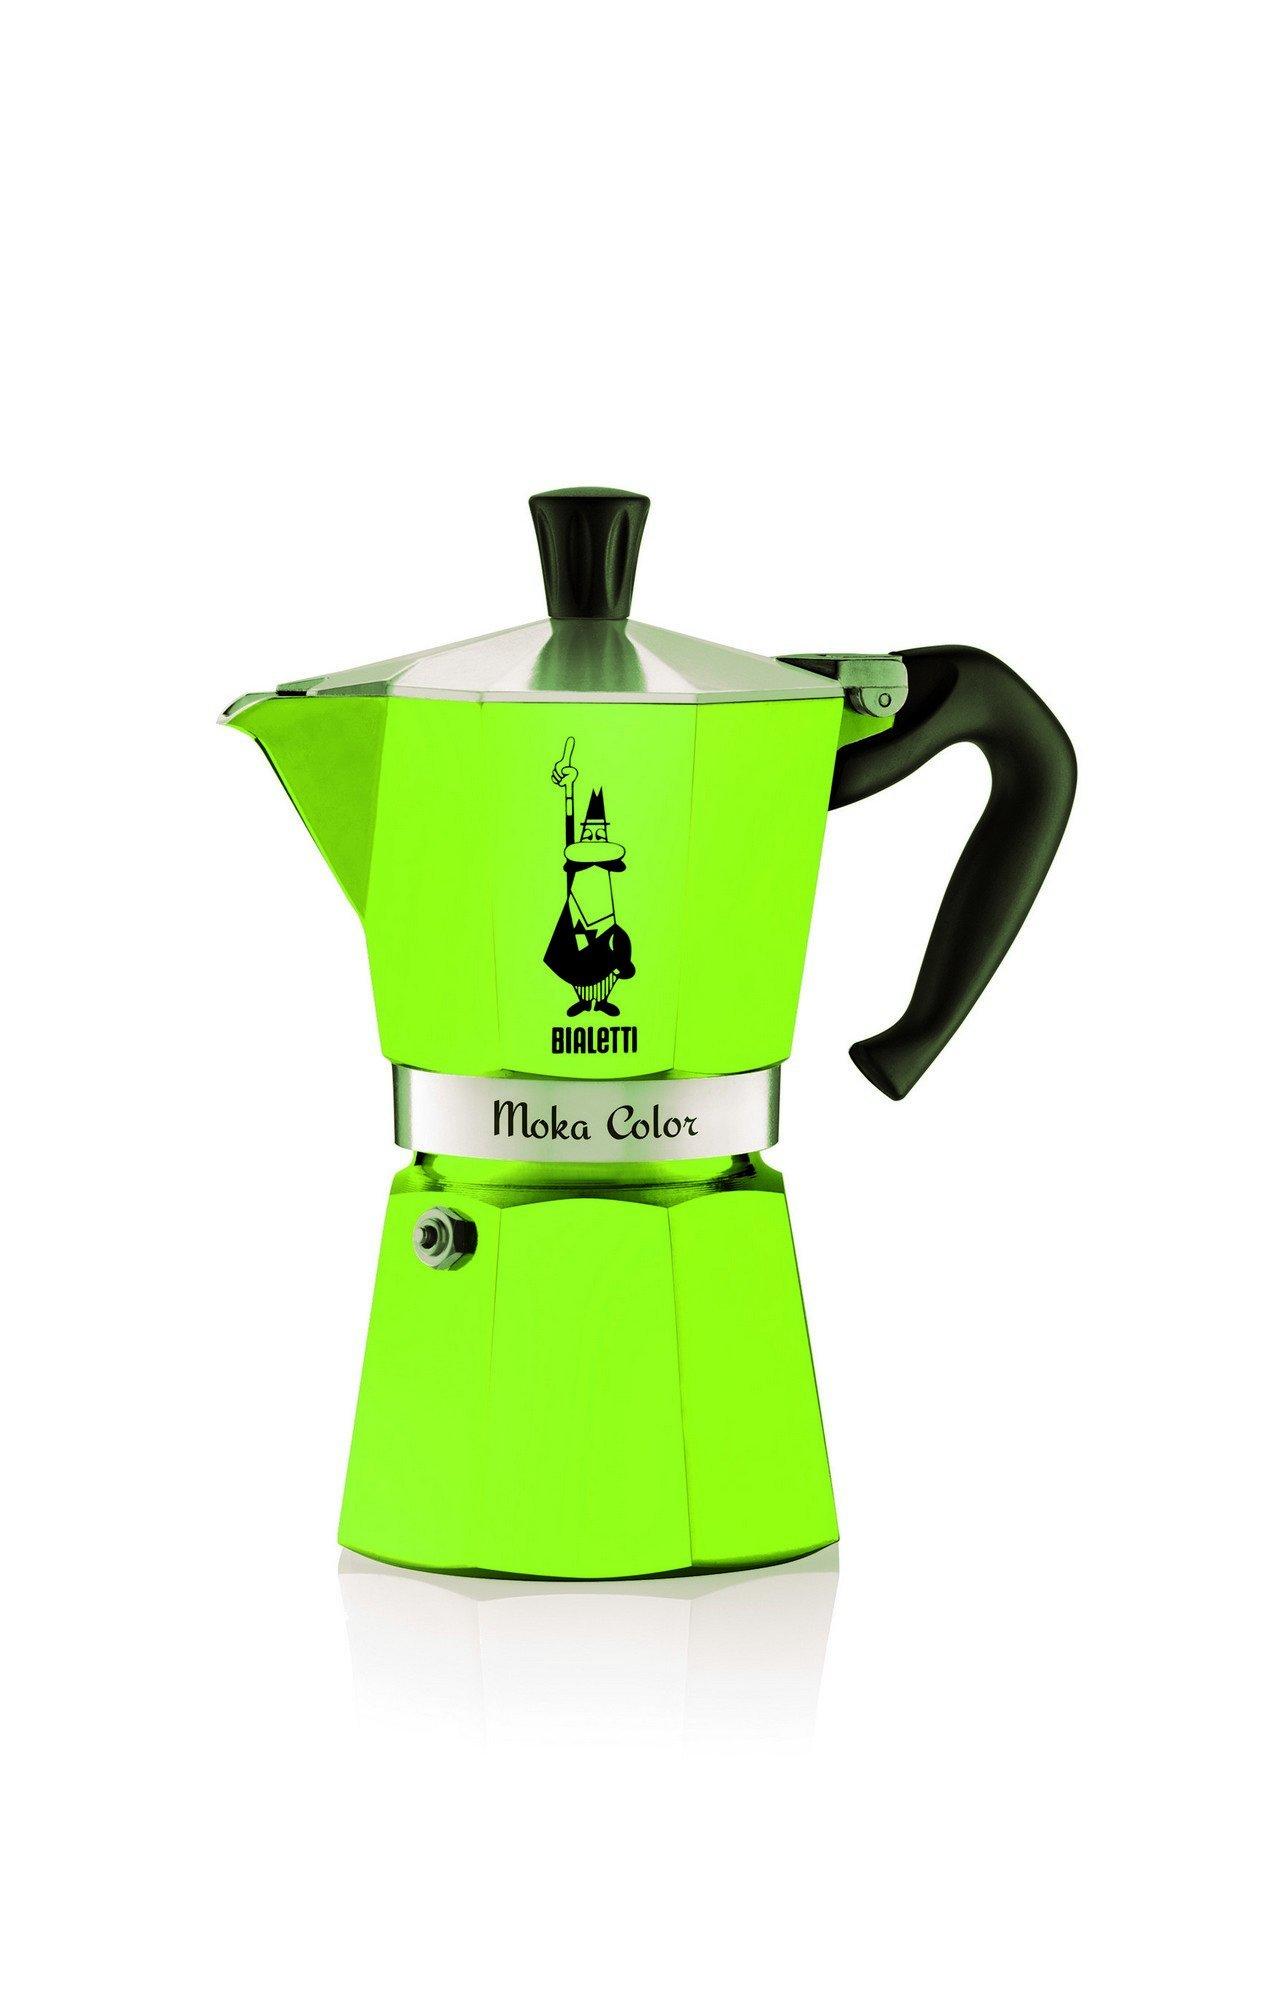 Bialetti 9123 Moka Express Color Espressokocher, Aluminium, Grün